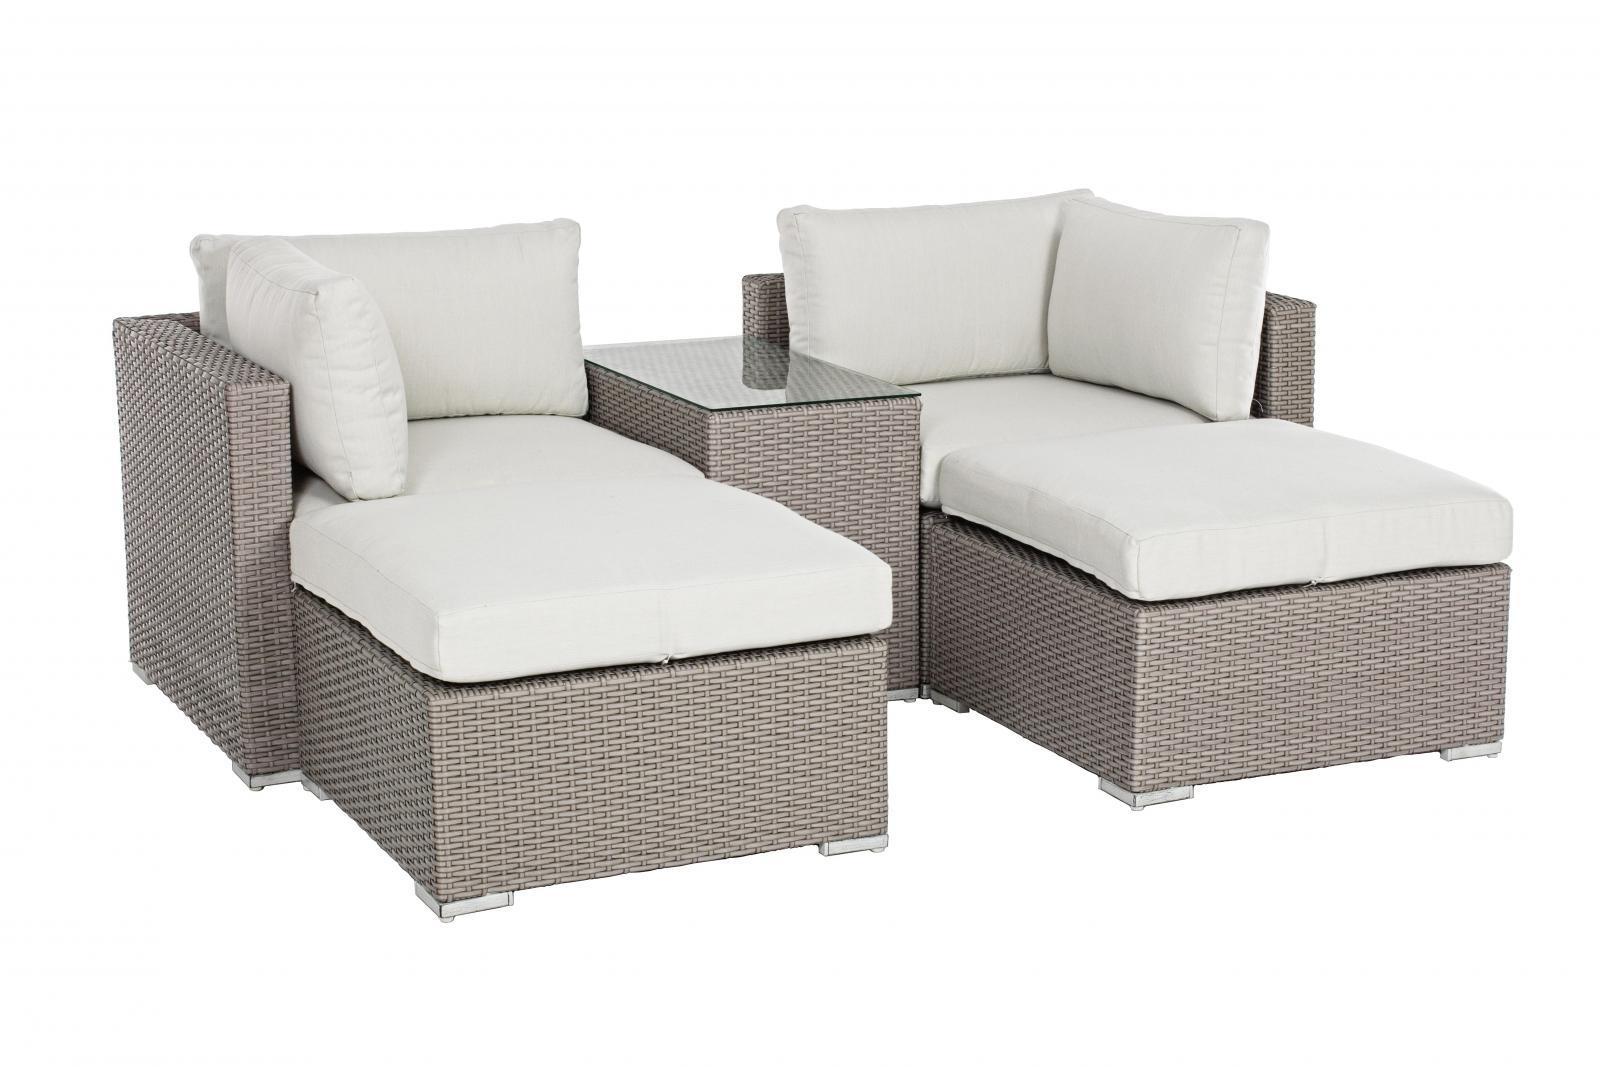 Комплект плетеной мебели Carlyn